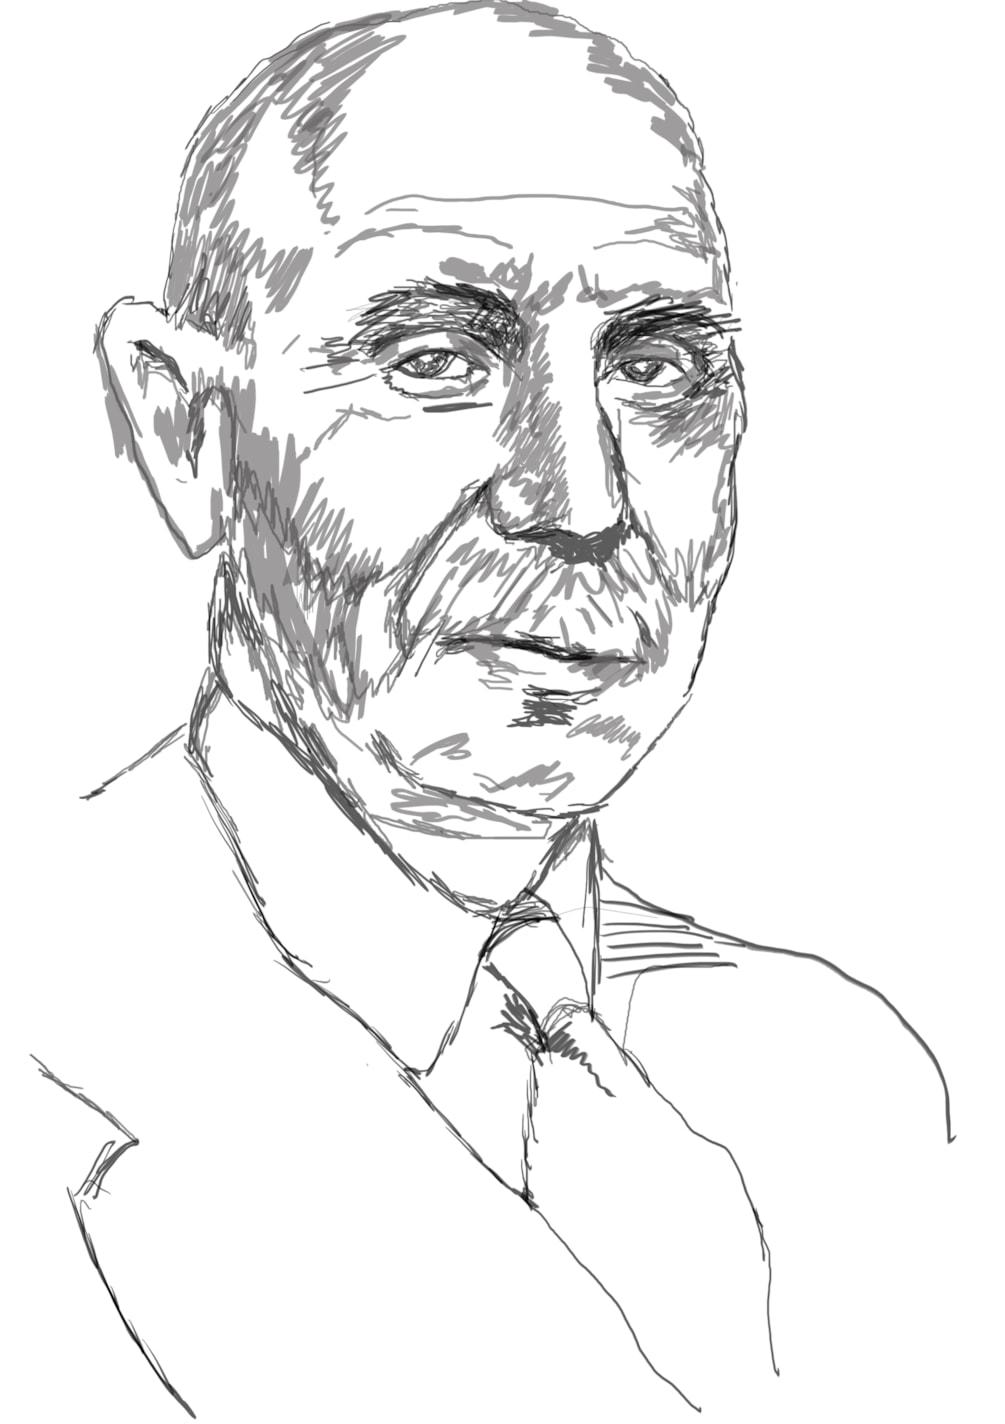 Digital pencil portrait